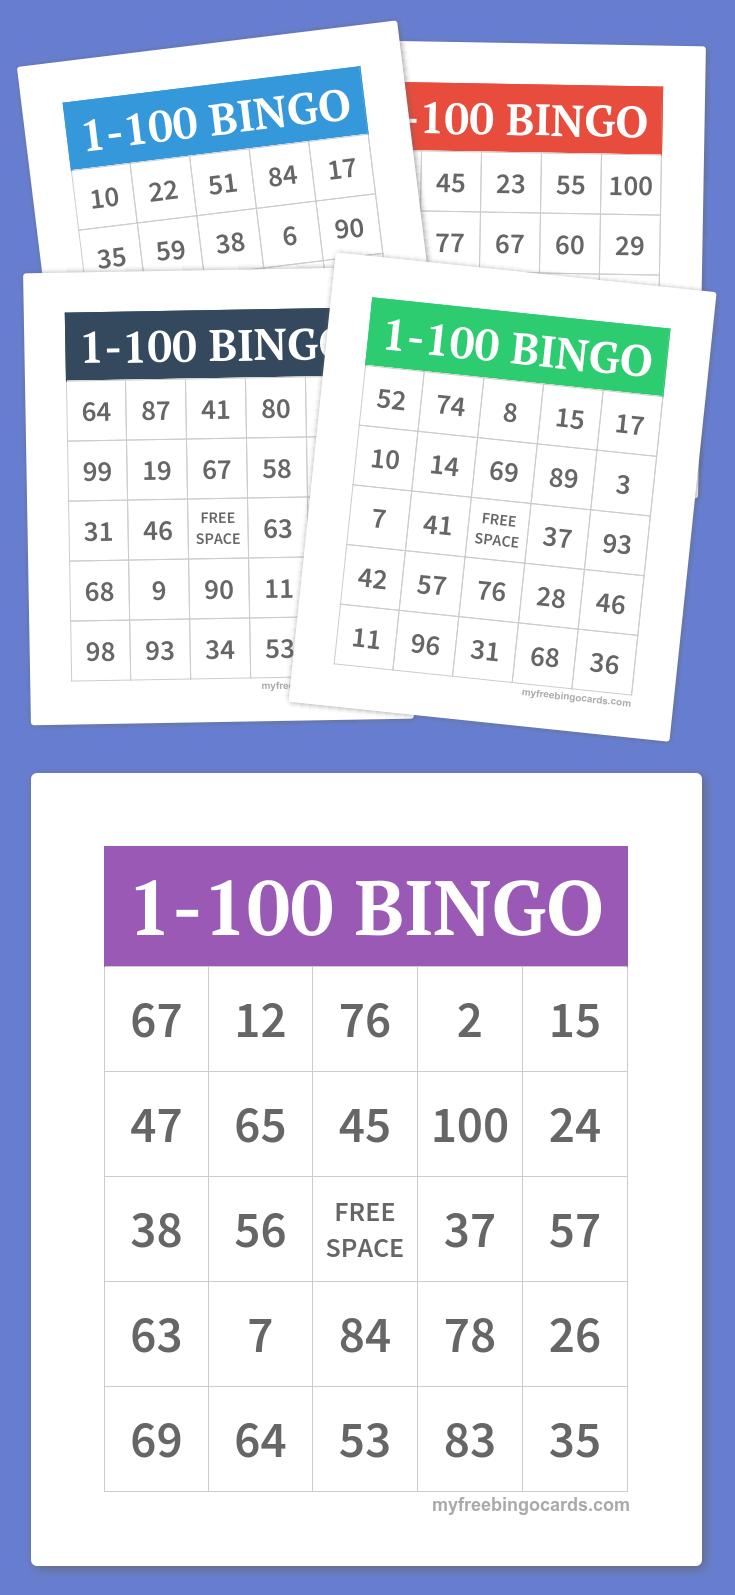 1-100 Bingo | Party Games - Free Printable Bingo Cards 1 100